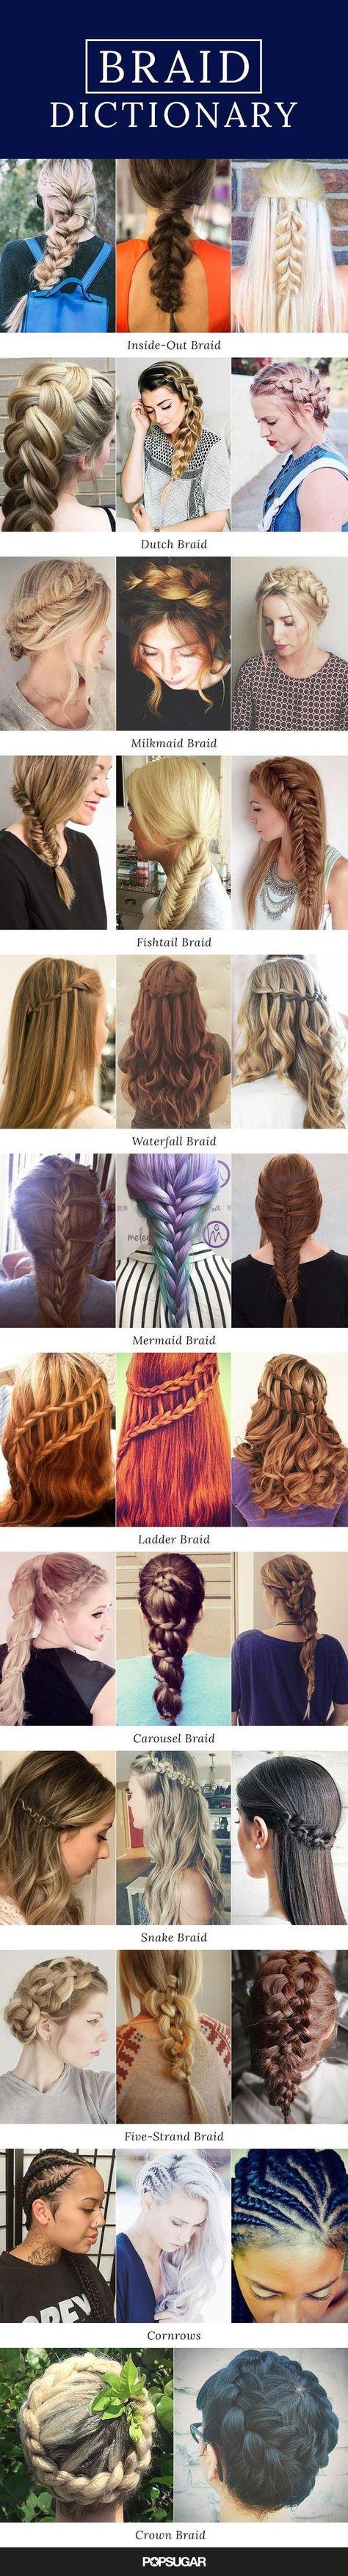 494 Best Hair & Beauty Images | Hair Beauty:__Cat__, Hair